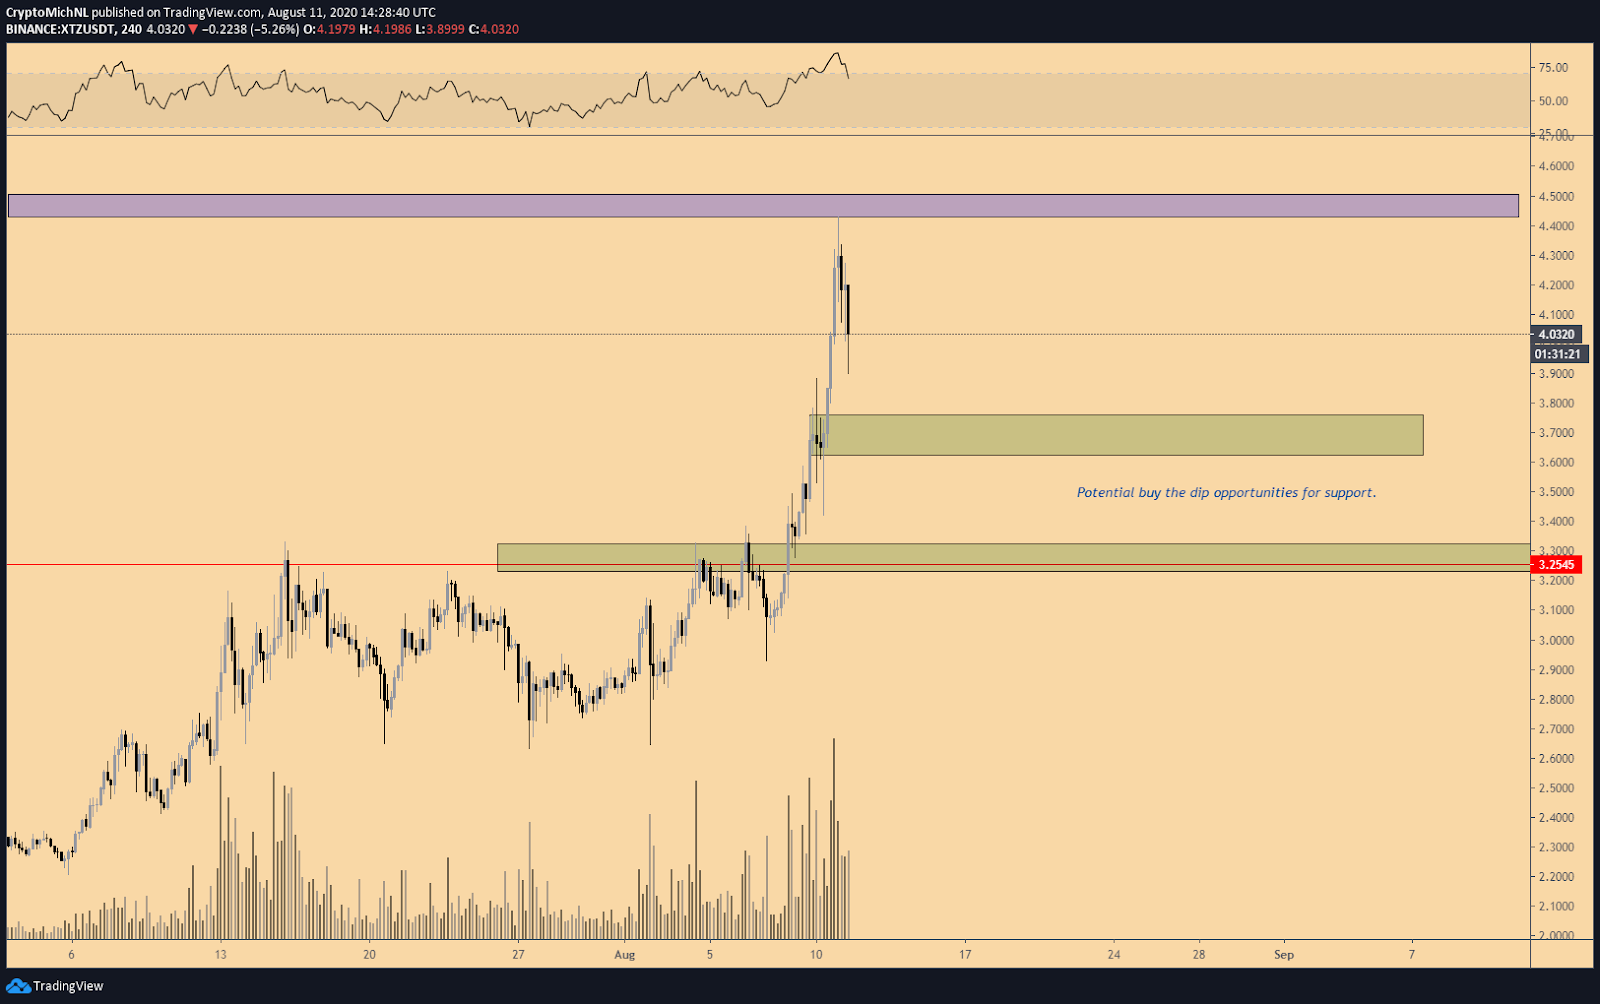 XTZ/USDT 4-hour chart